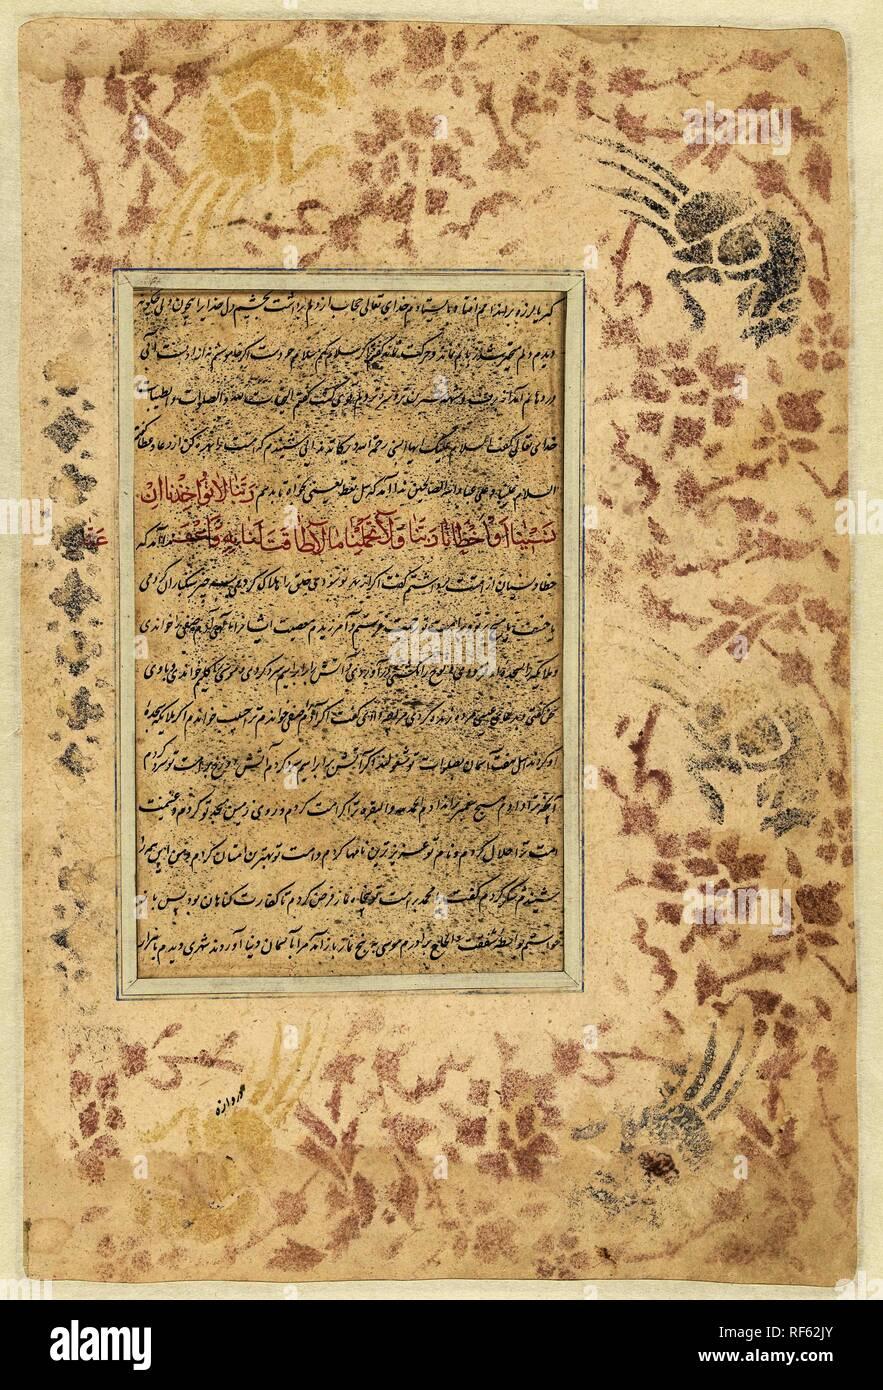 Calligraphy in Nastaliq script in a frame of colored